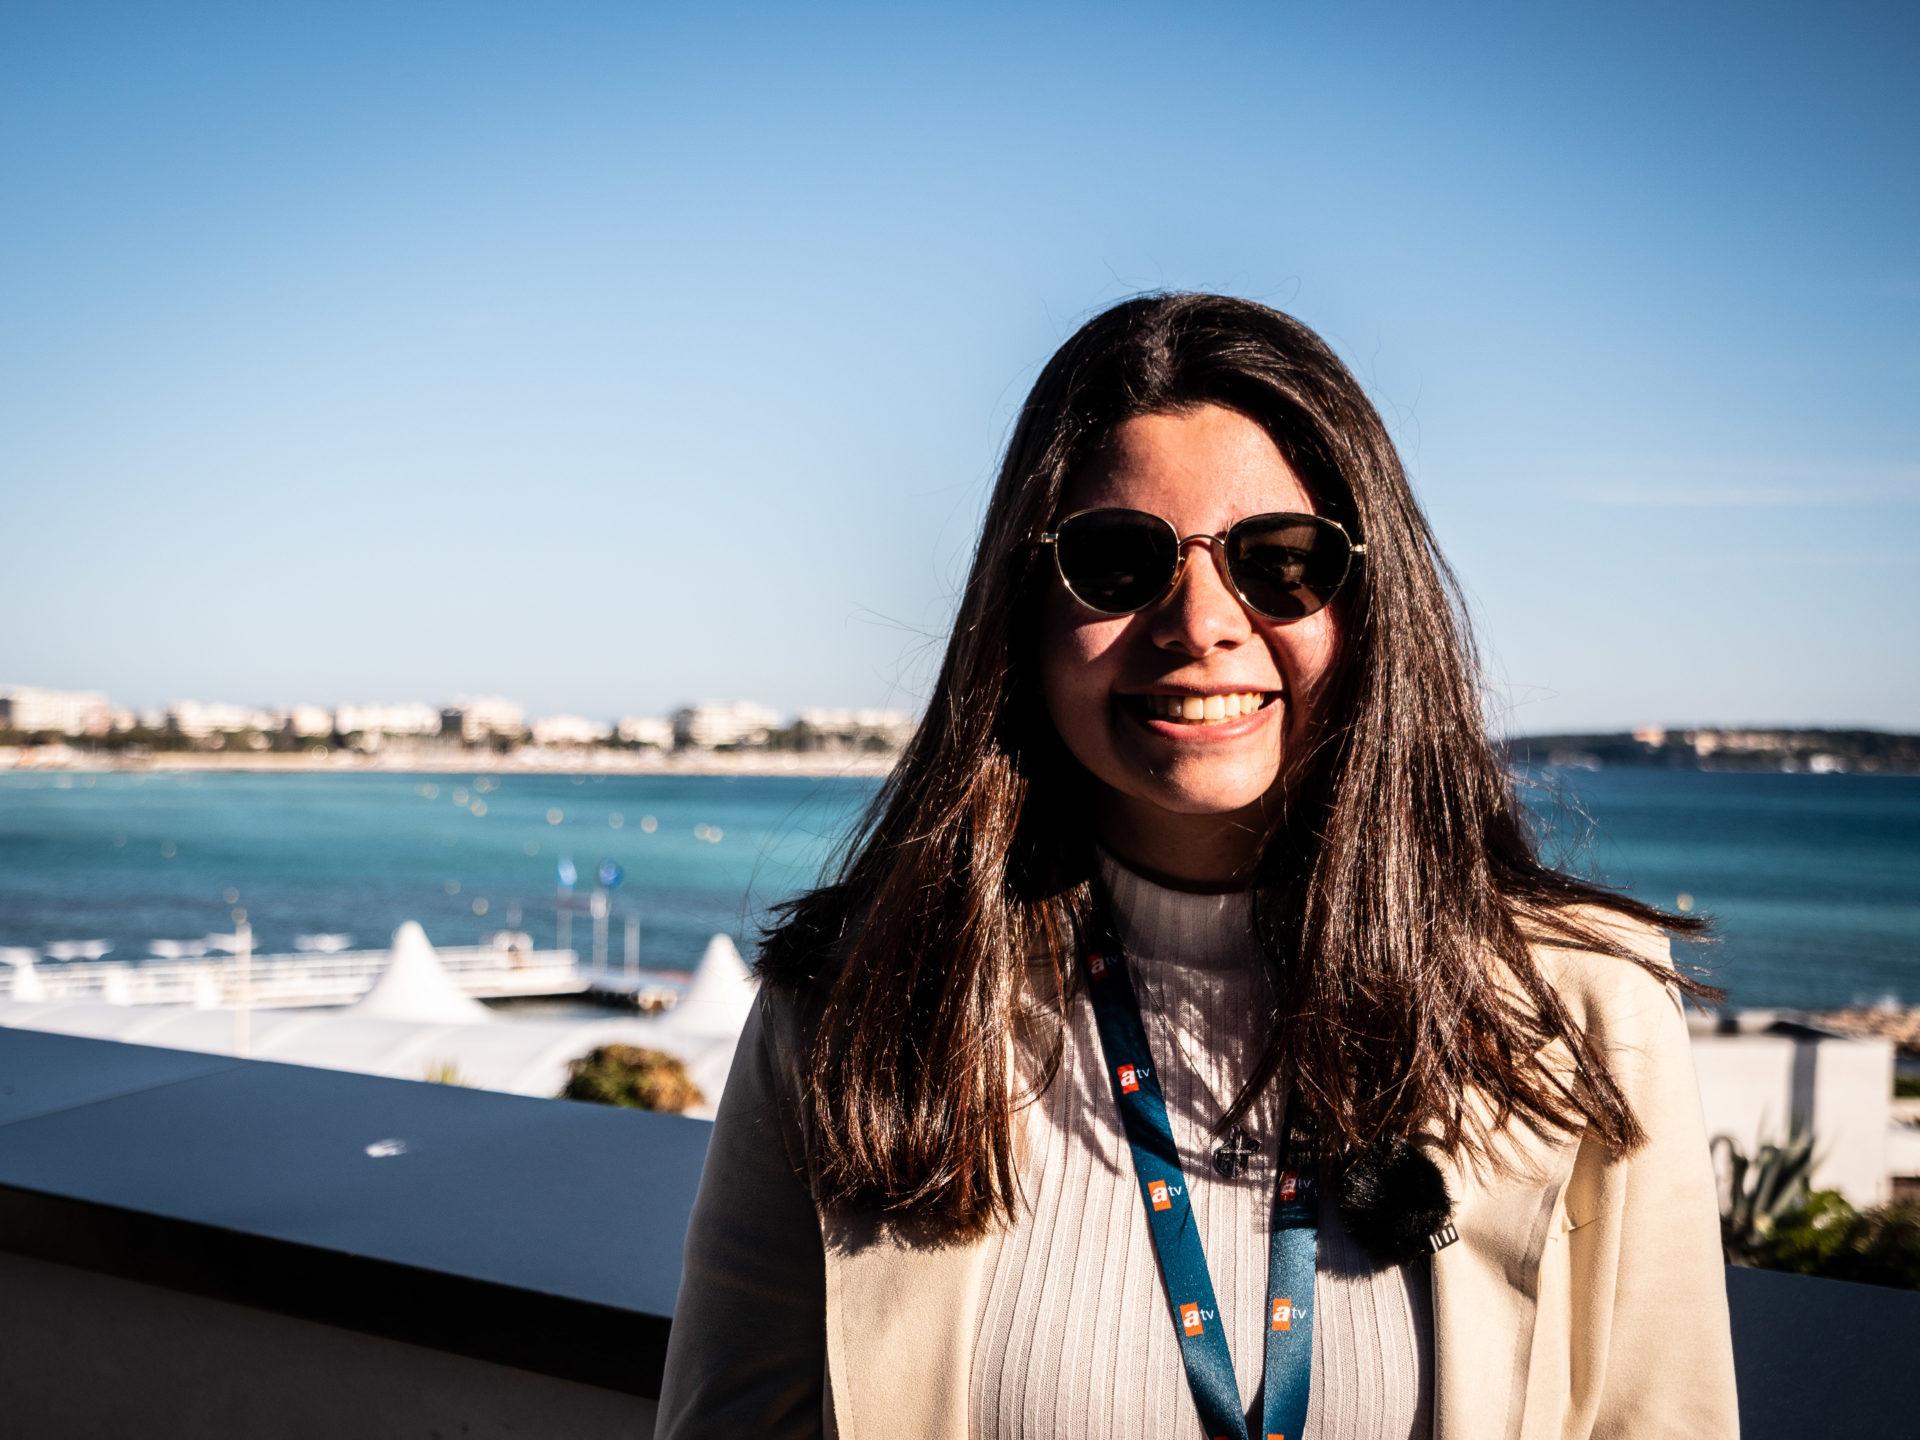 Rencontre avec Sofia Balestrini au MIPTV